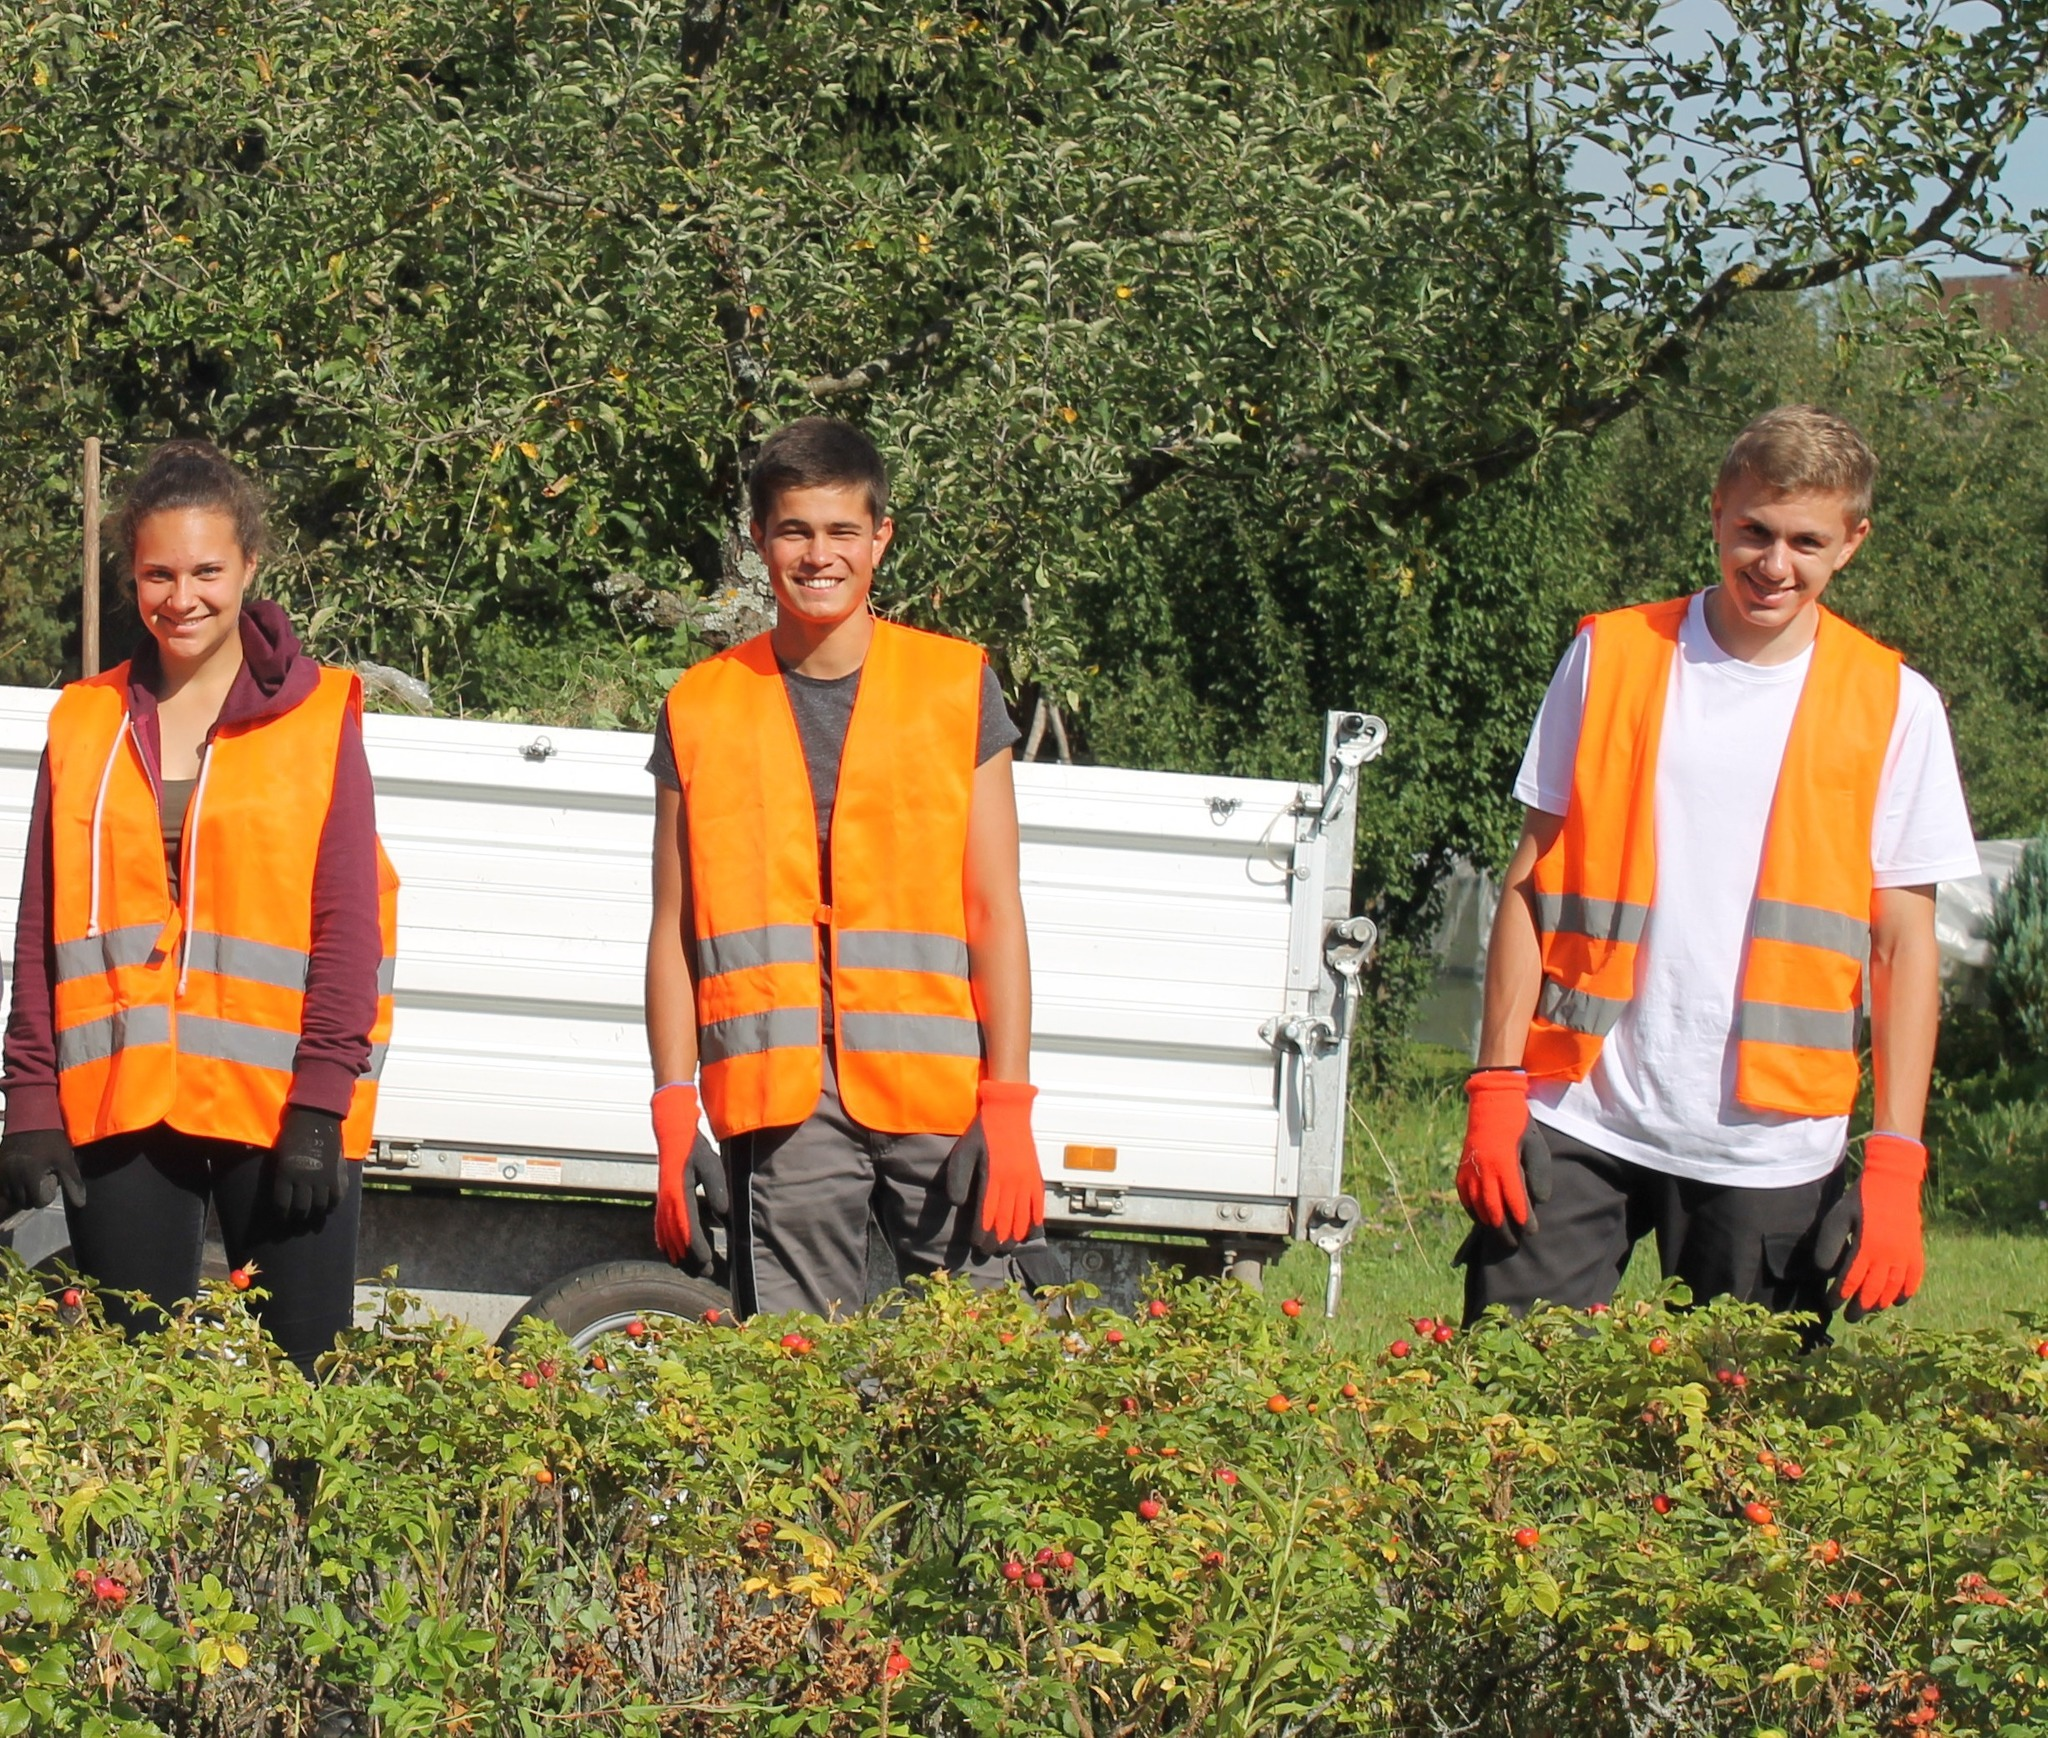 Lara Schubert, Kian Graefe, Steven Metzger jobben bei der Stadt Ettenheim.